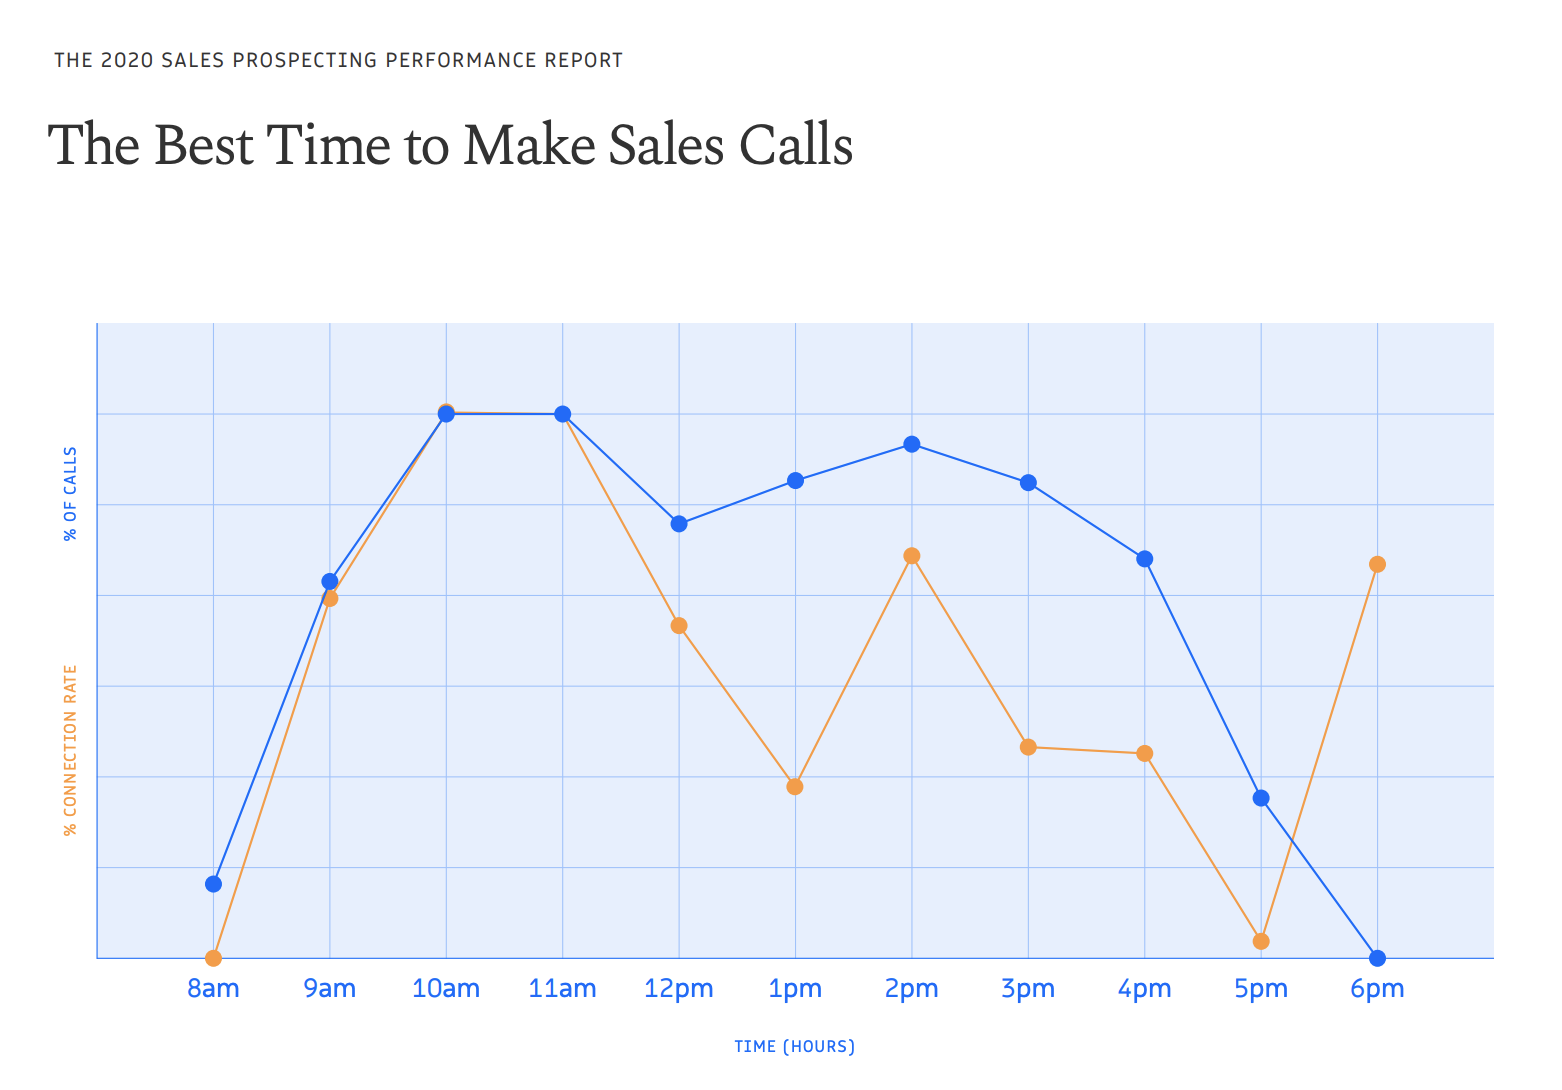 2020 sales statistics show best time to make sales calls